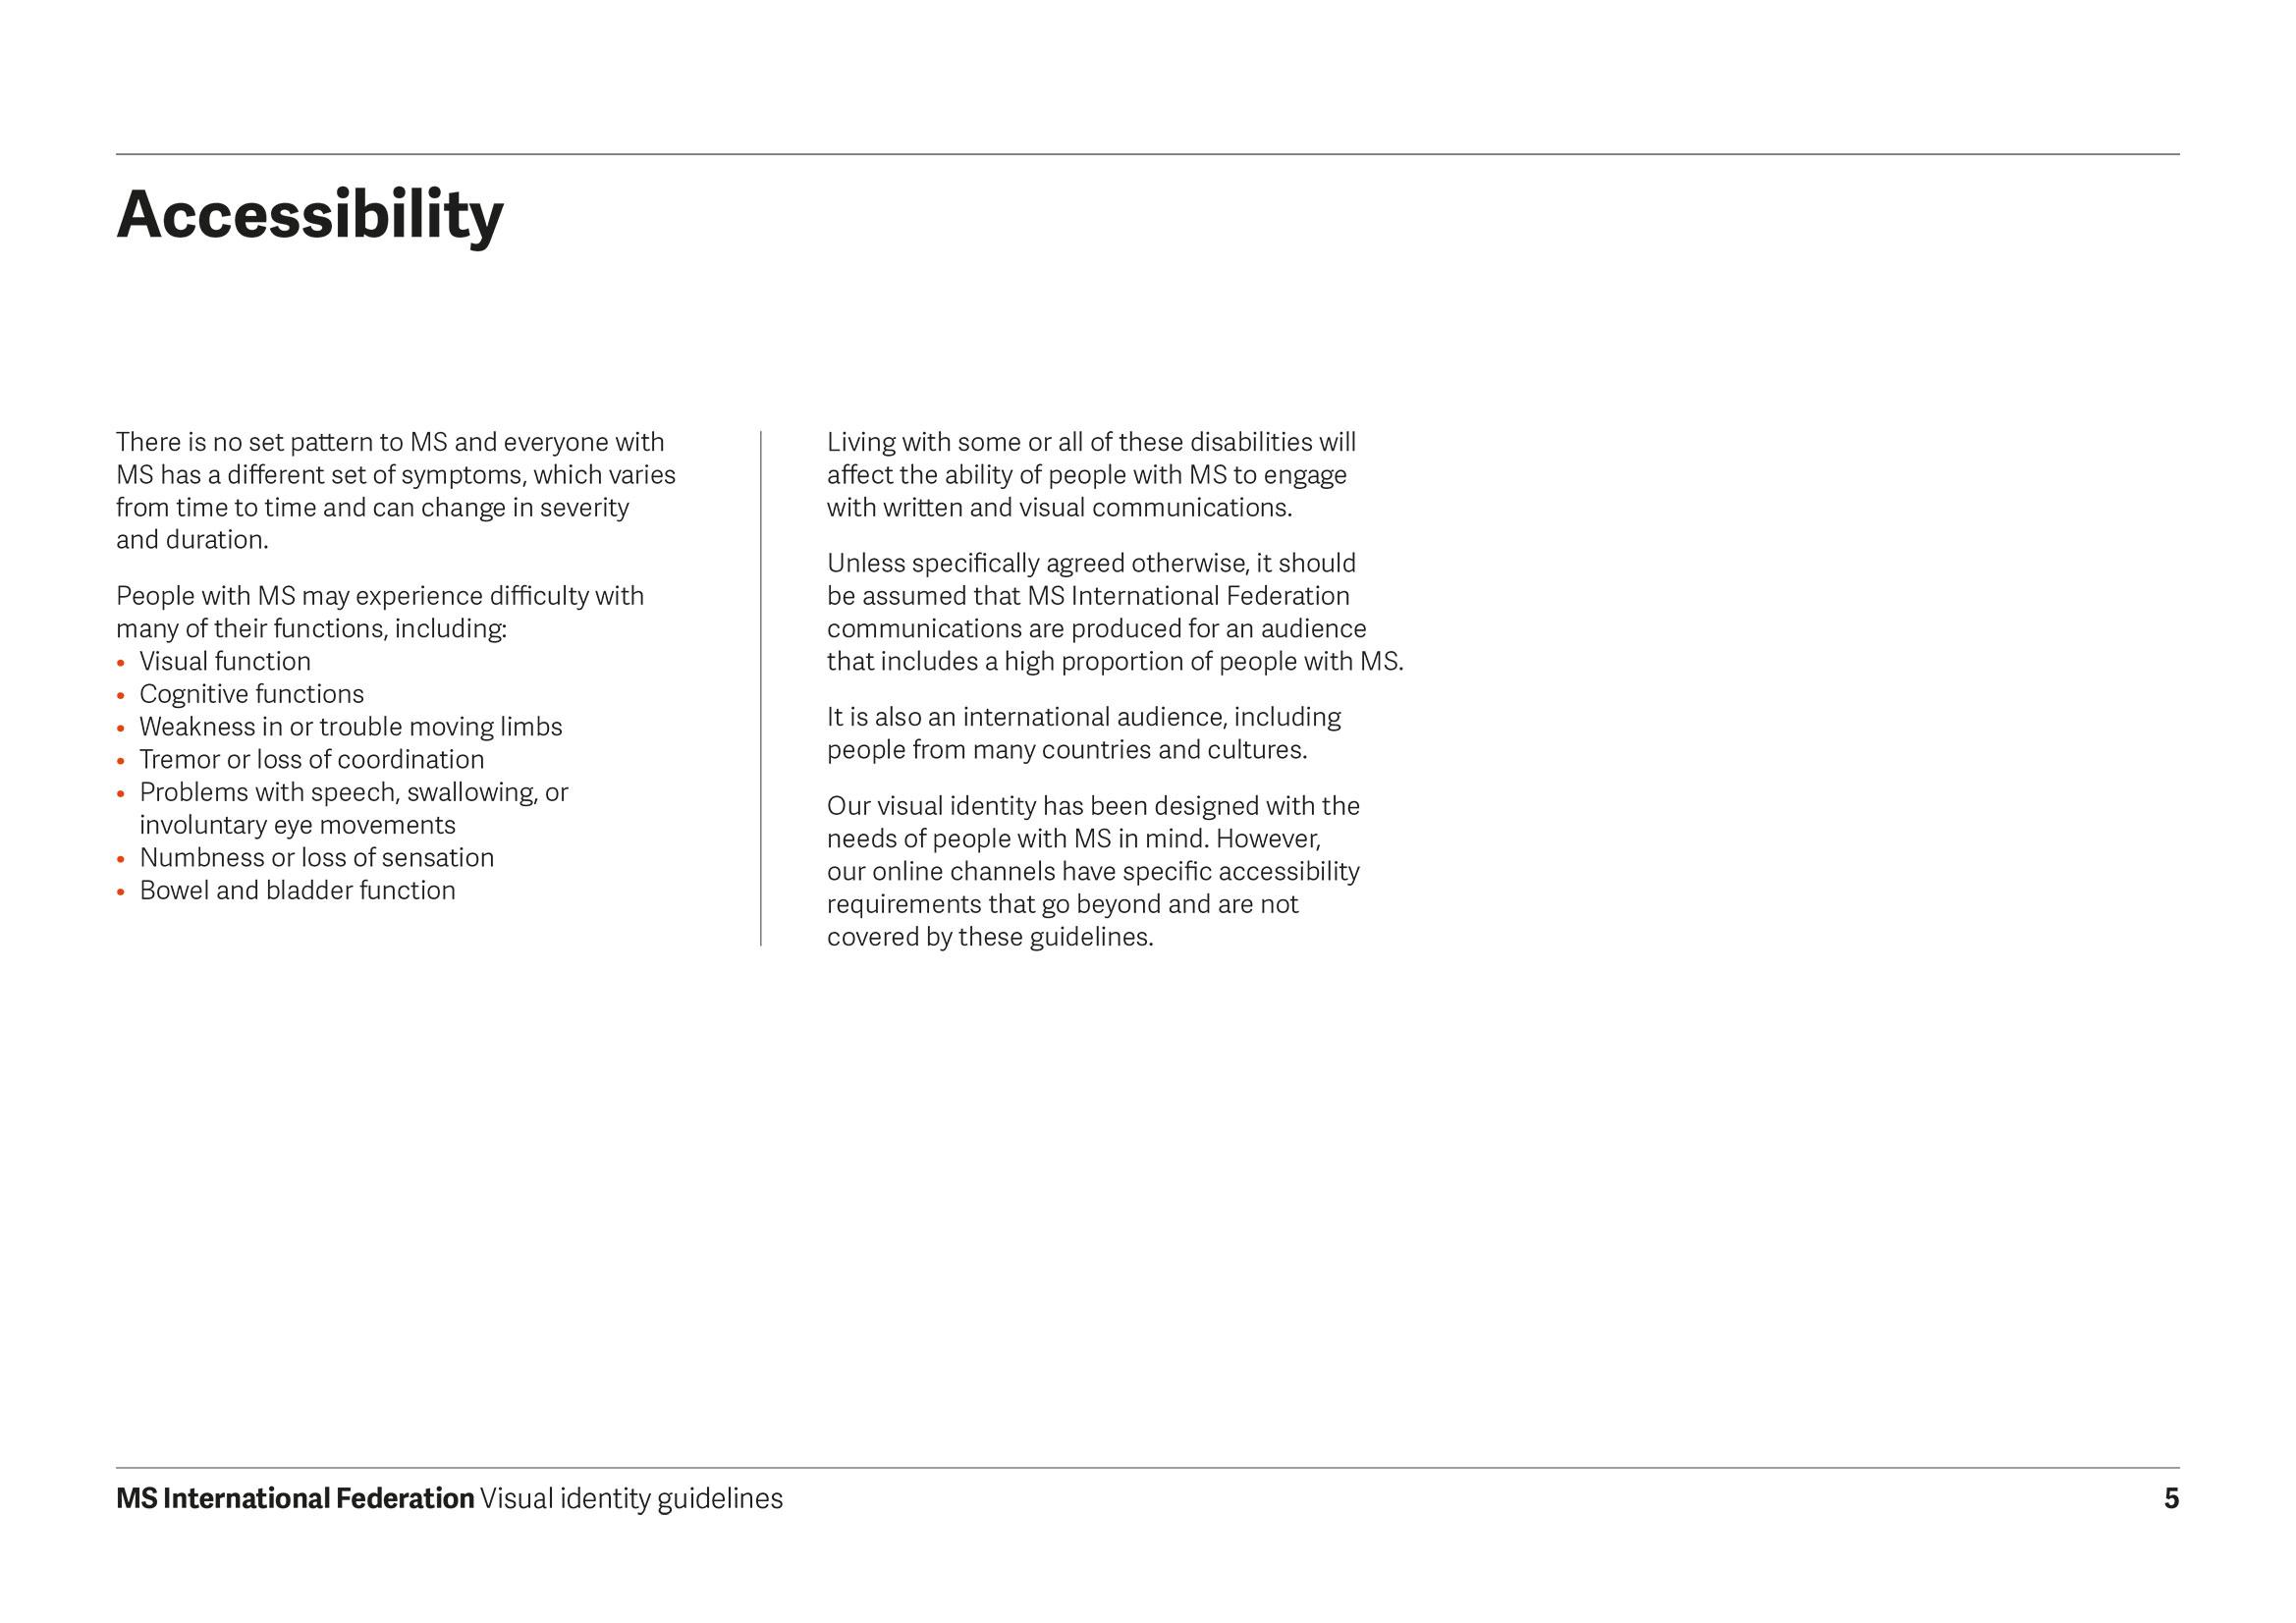 MSIF-VISUAL-IDENTITY-GUIDELINES-5.jpg